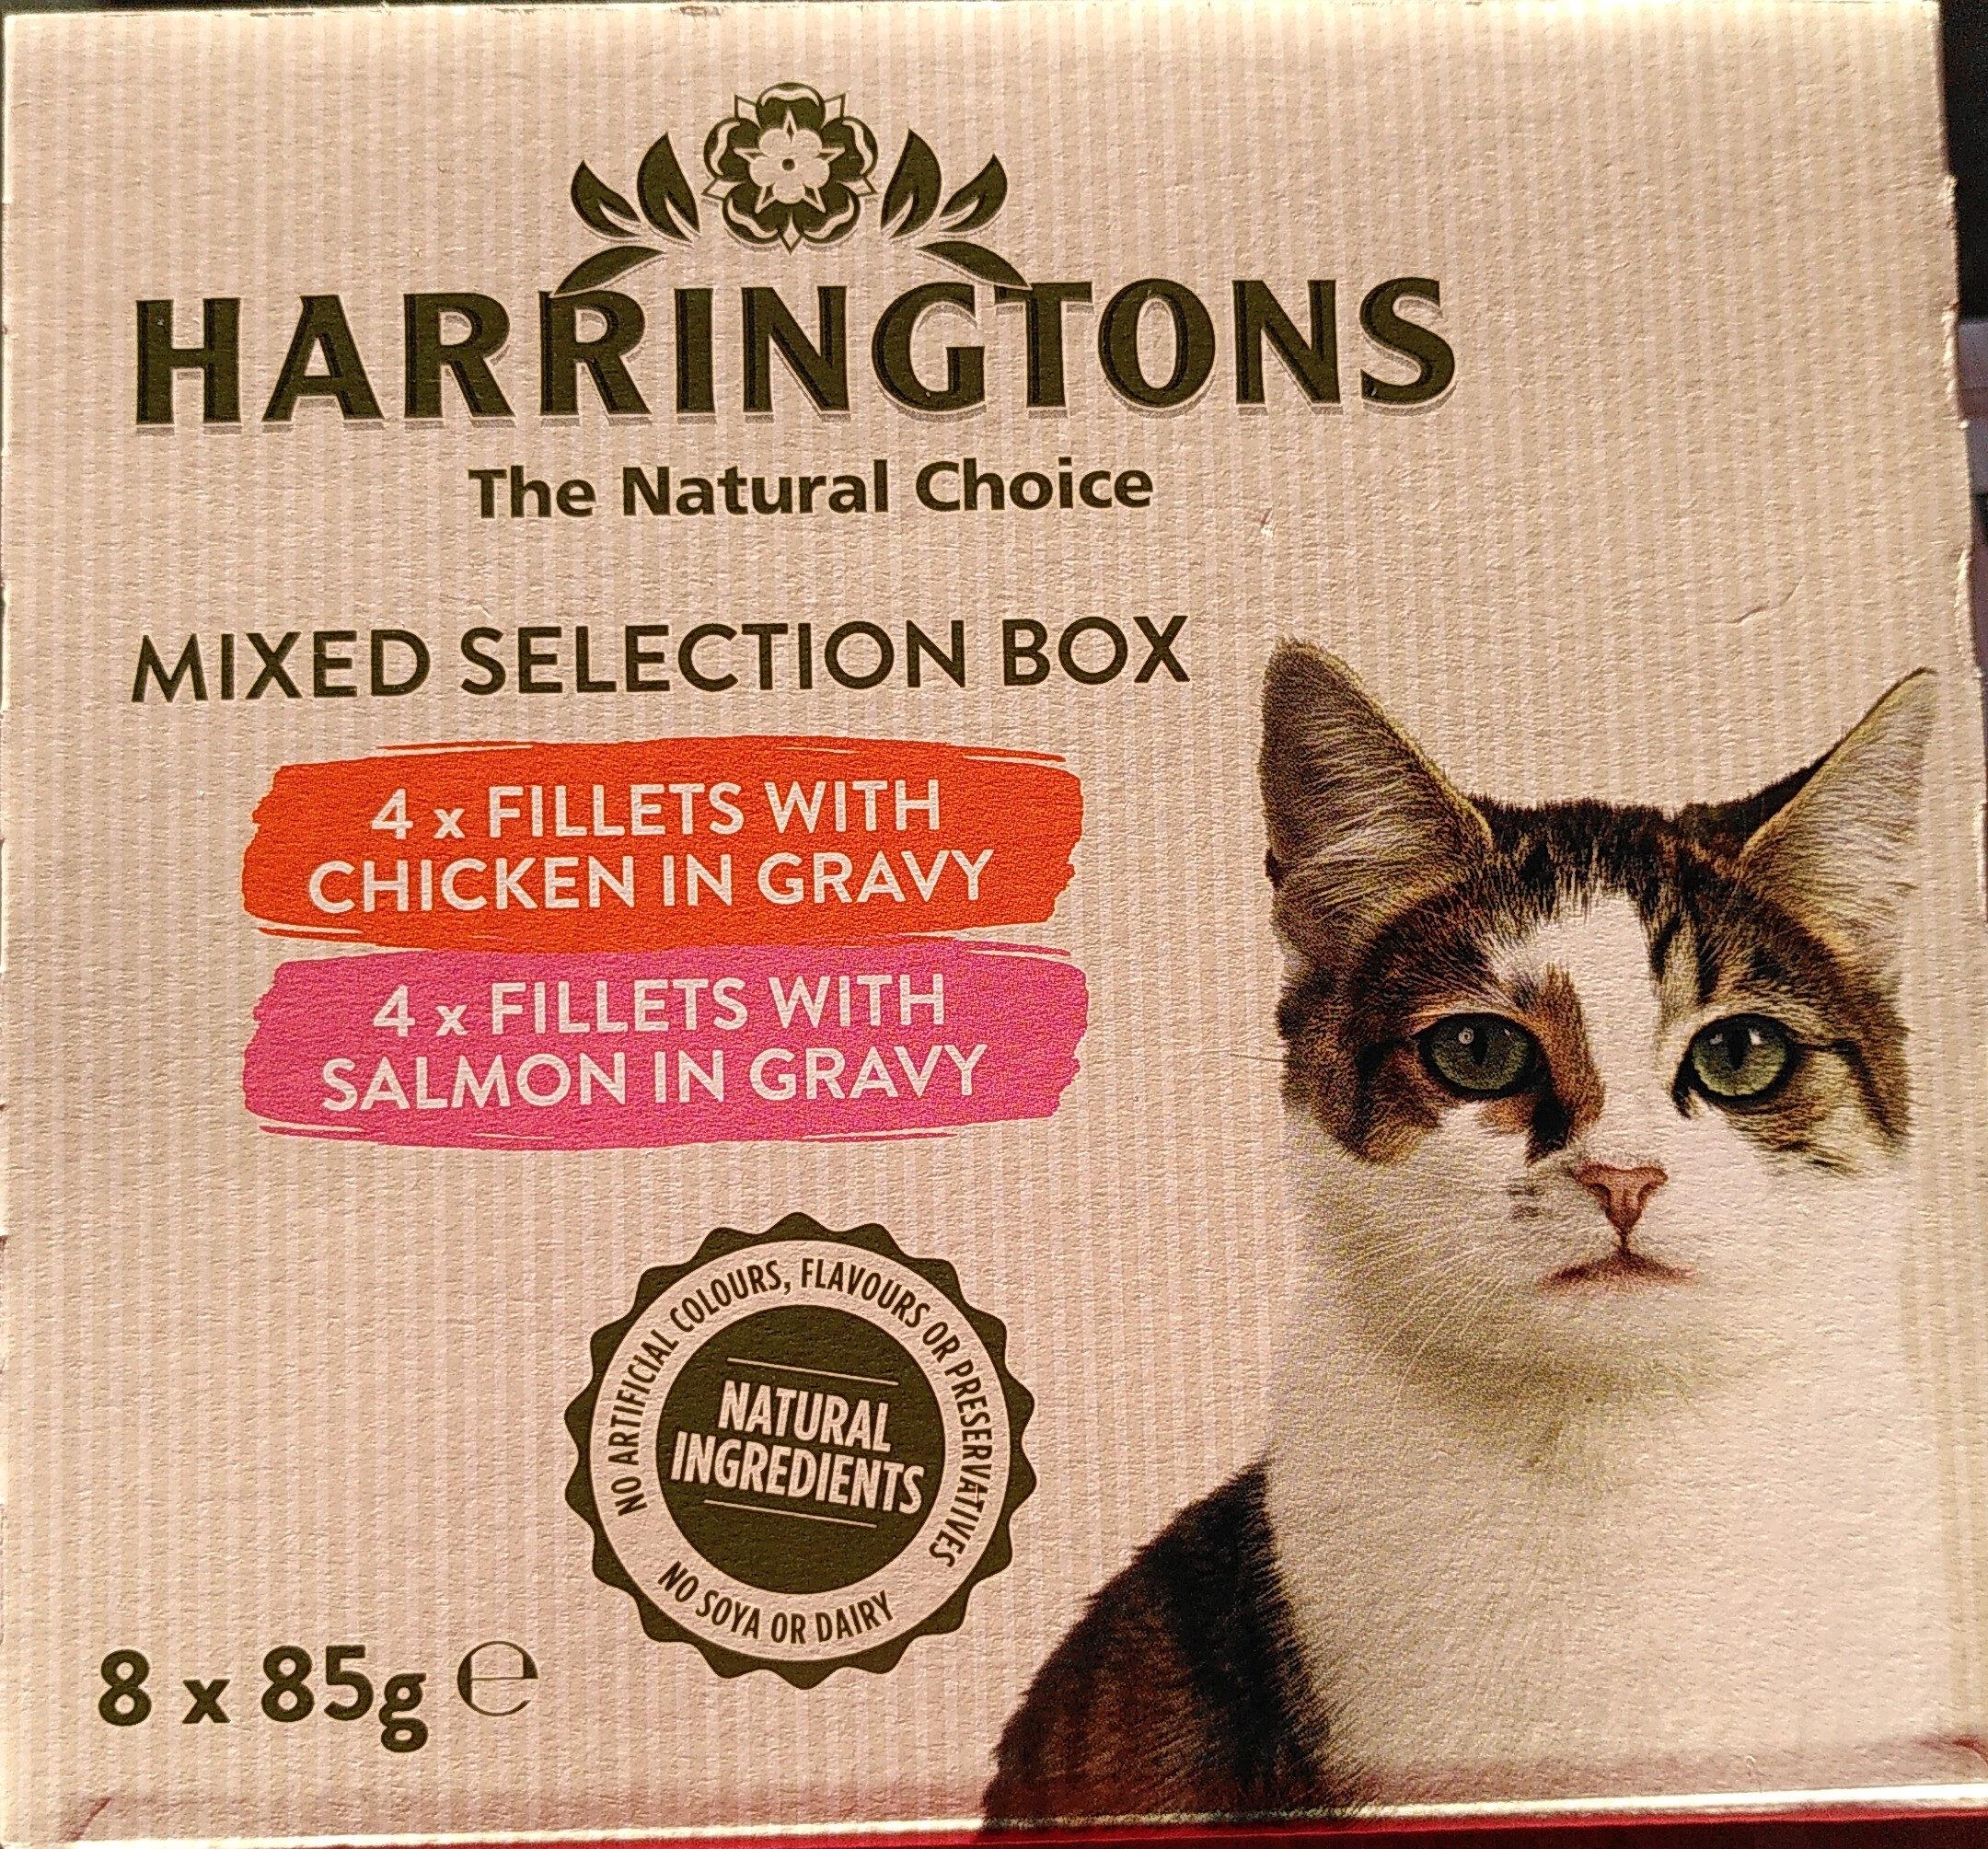 mixed selection box - Product - en